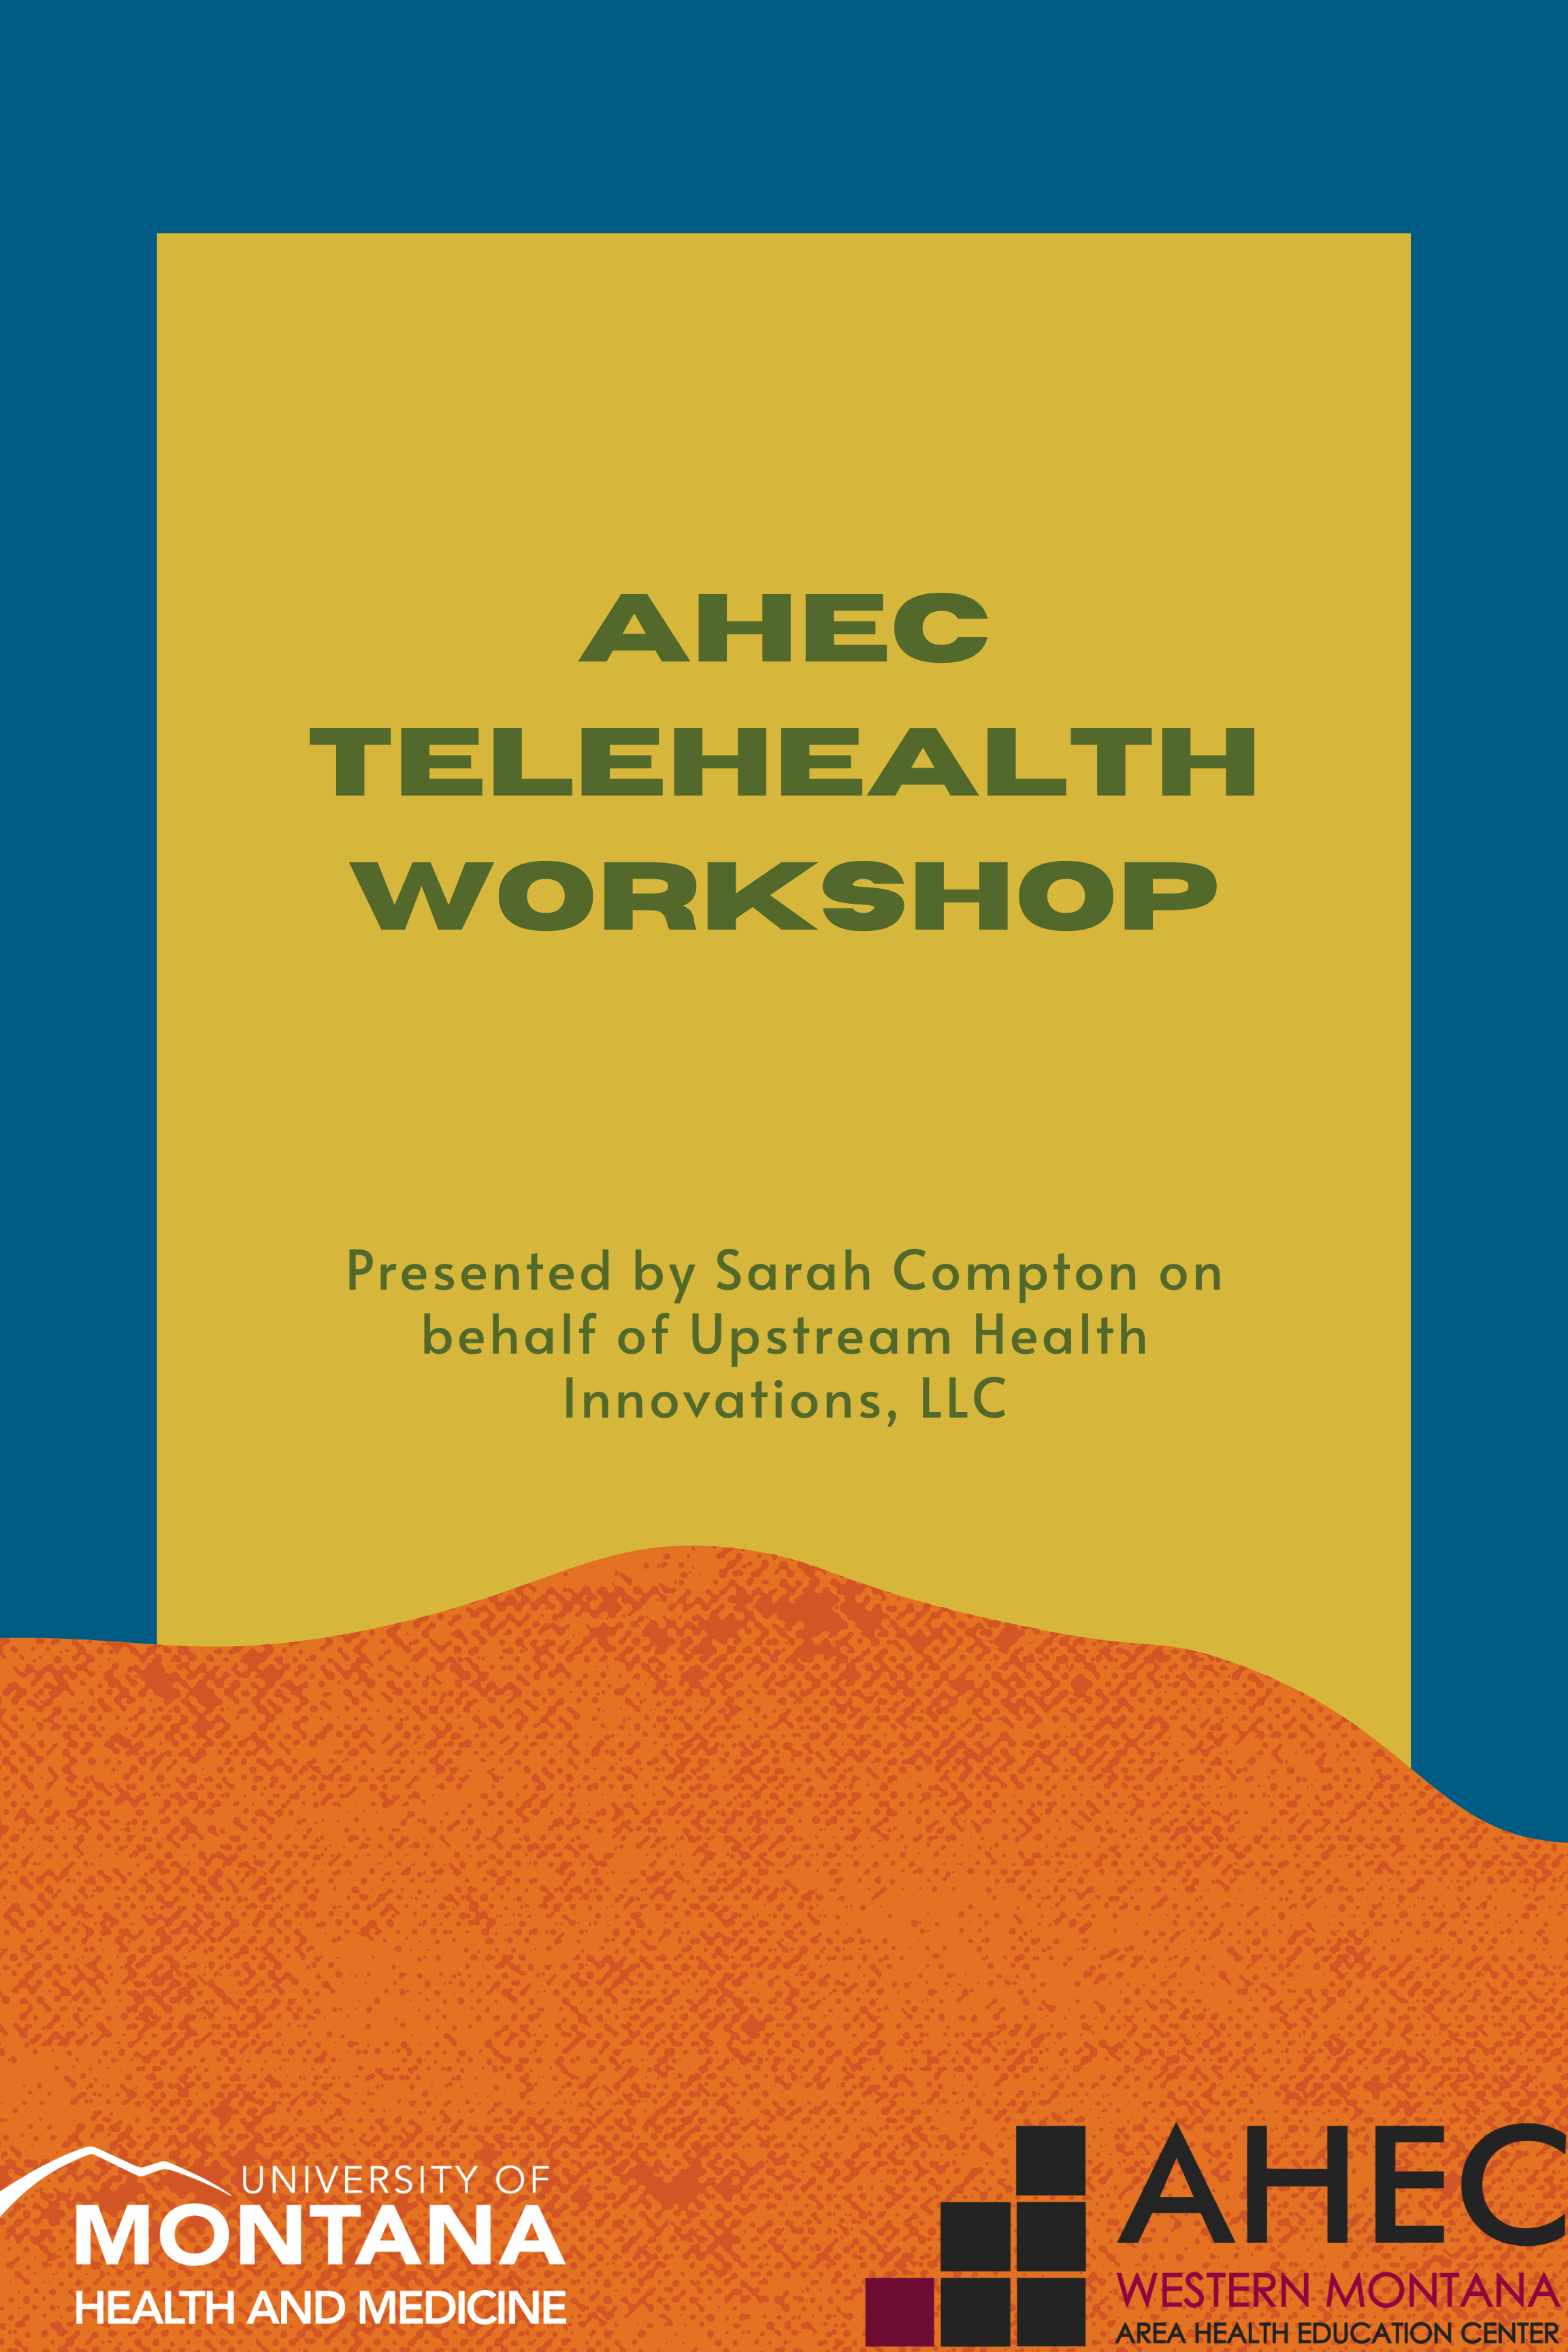 AHEC Telehealth Workshop